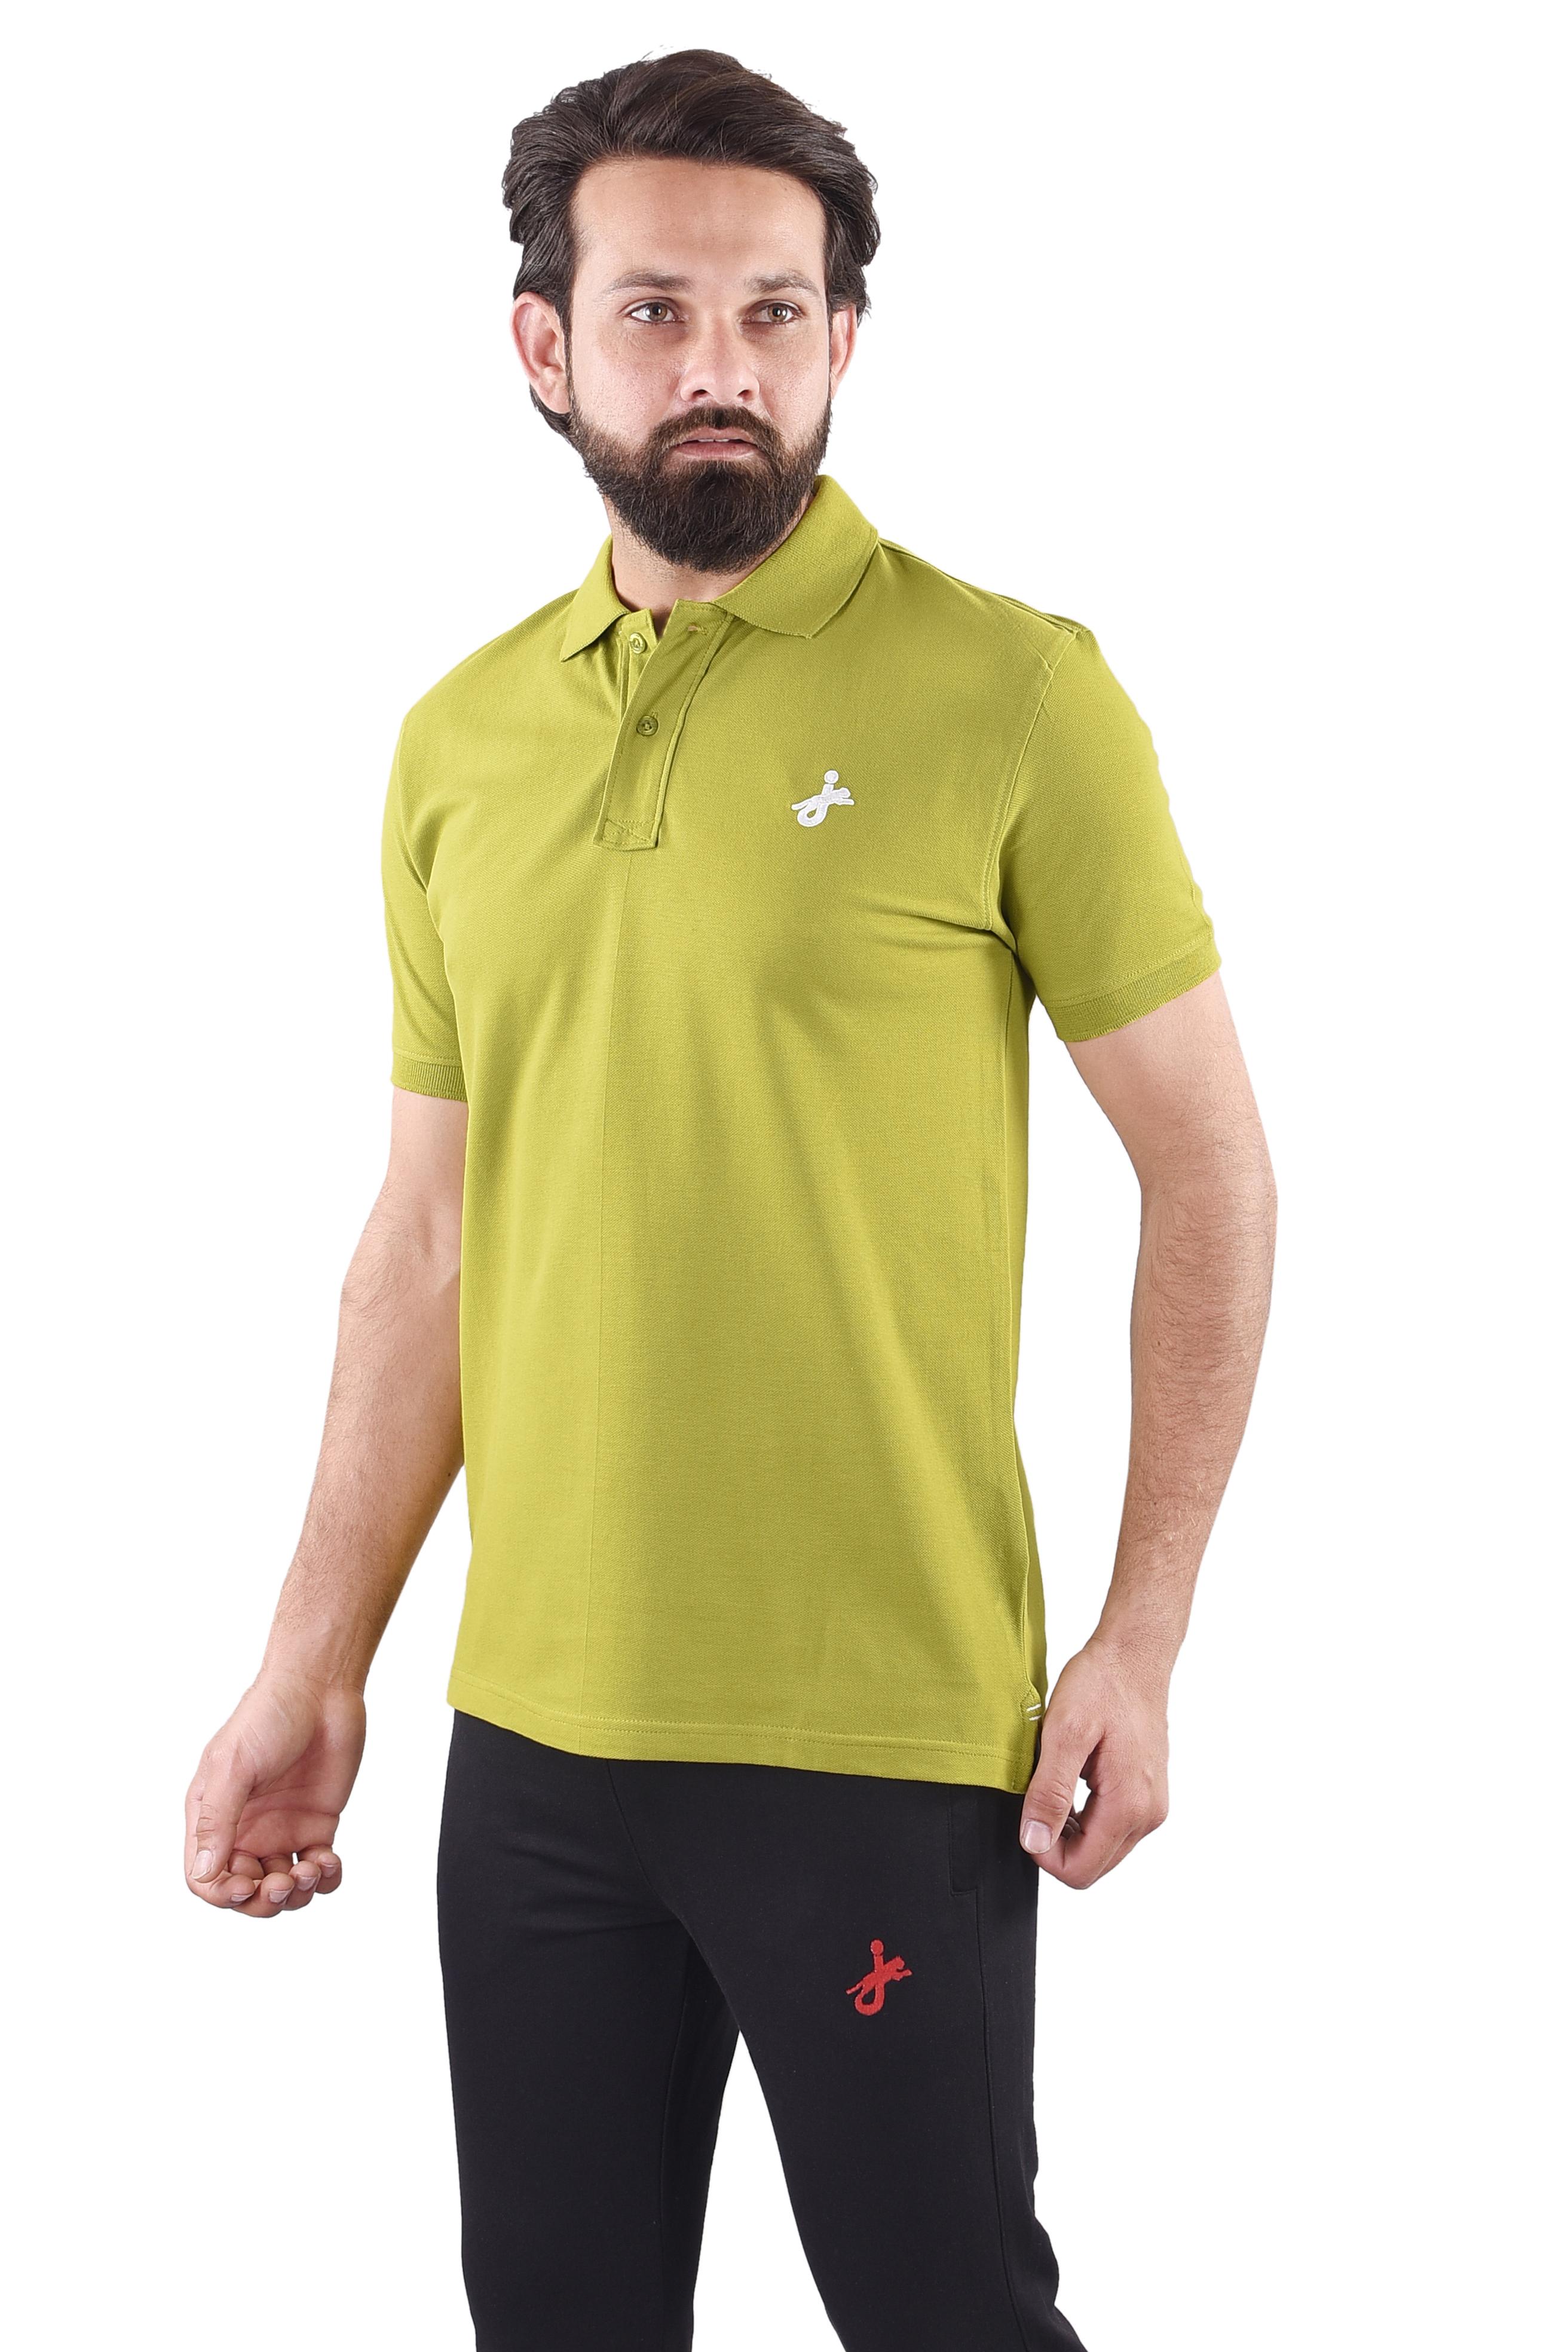 JAGURO | JAGURO  Men's Cotton Solid Polo Collar  T-Shirt.